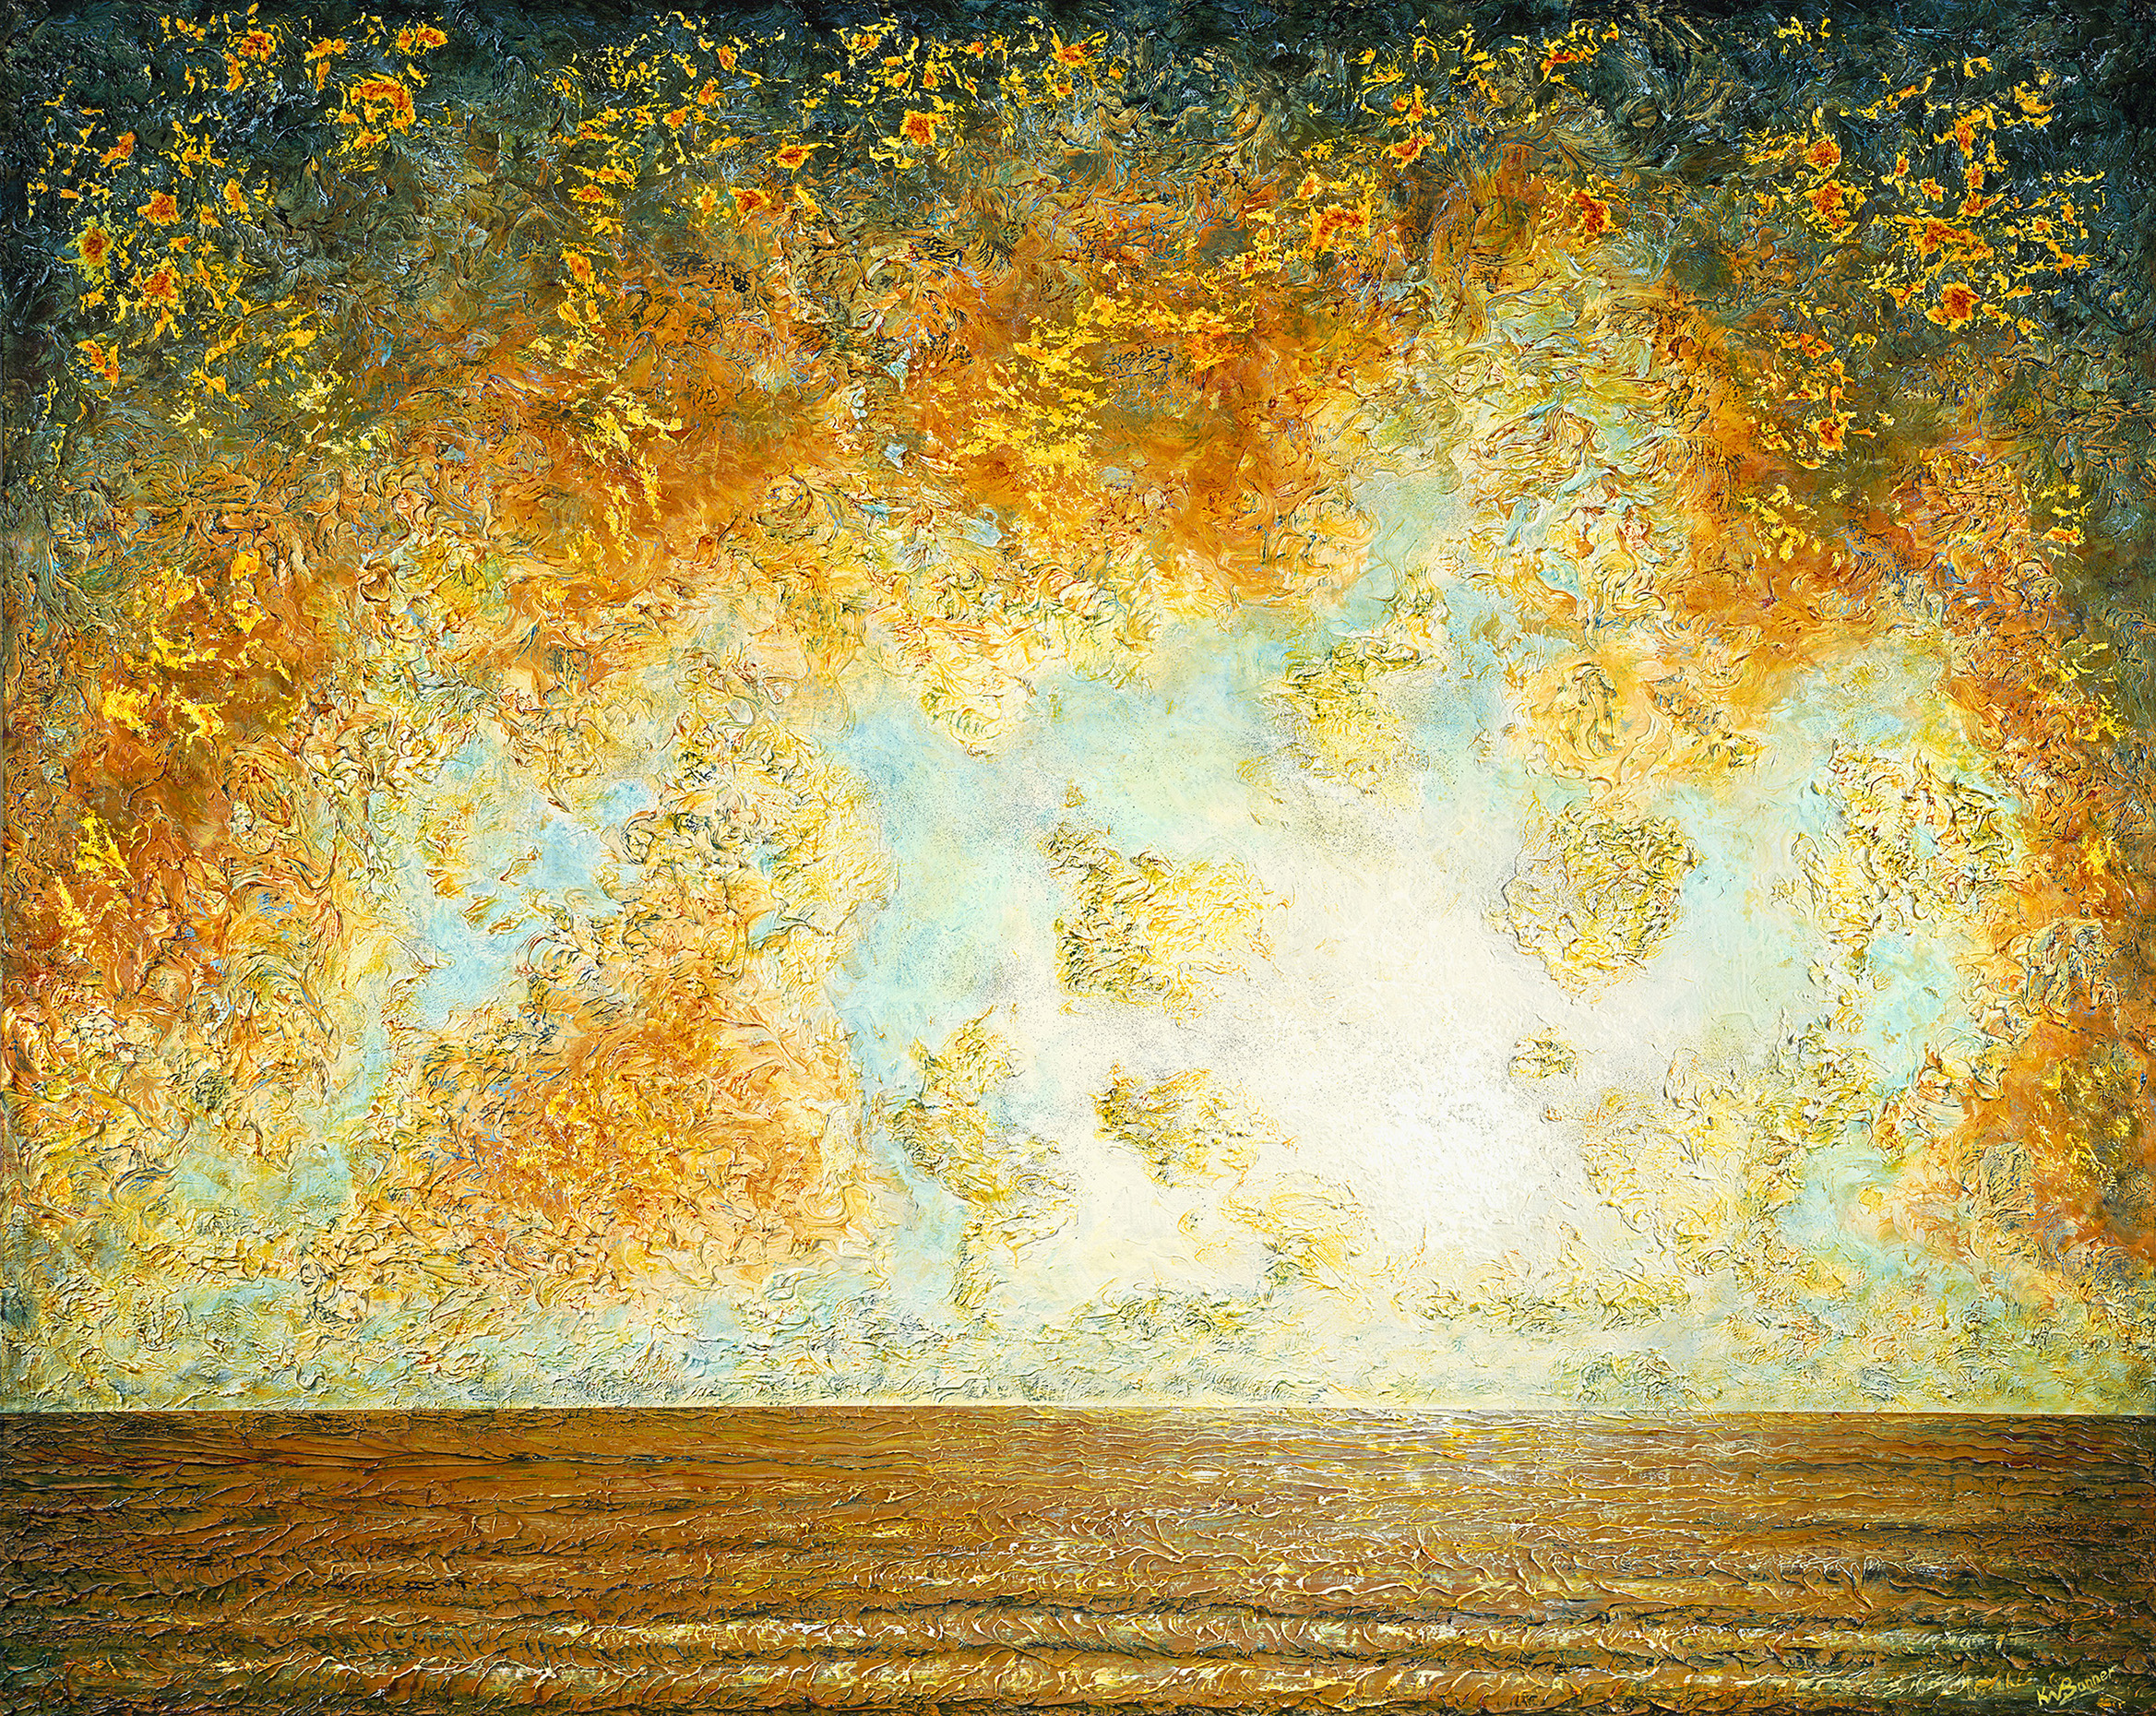 Nessun Dorma | Seascapes | Ken Bonner Original Oil Paintings | Santa Fe New Mexico